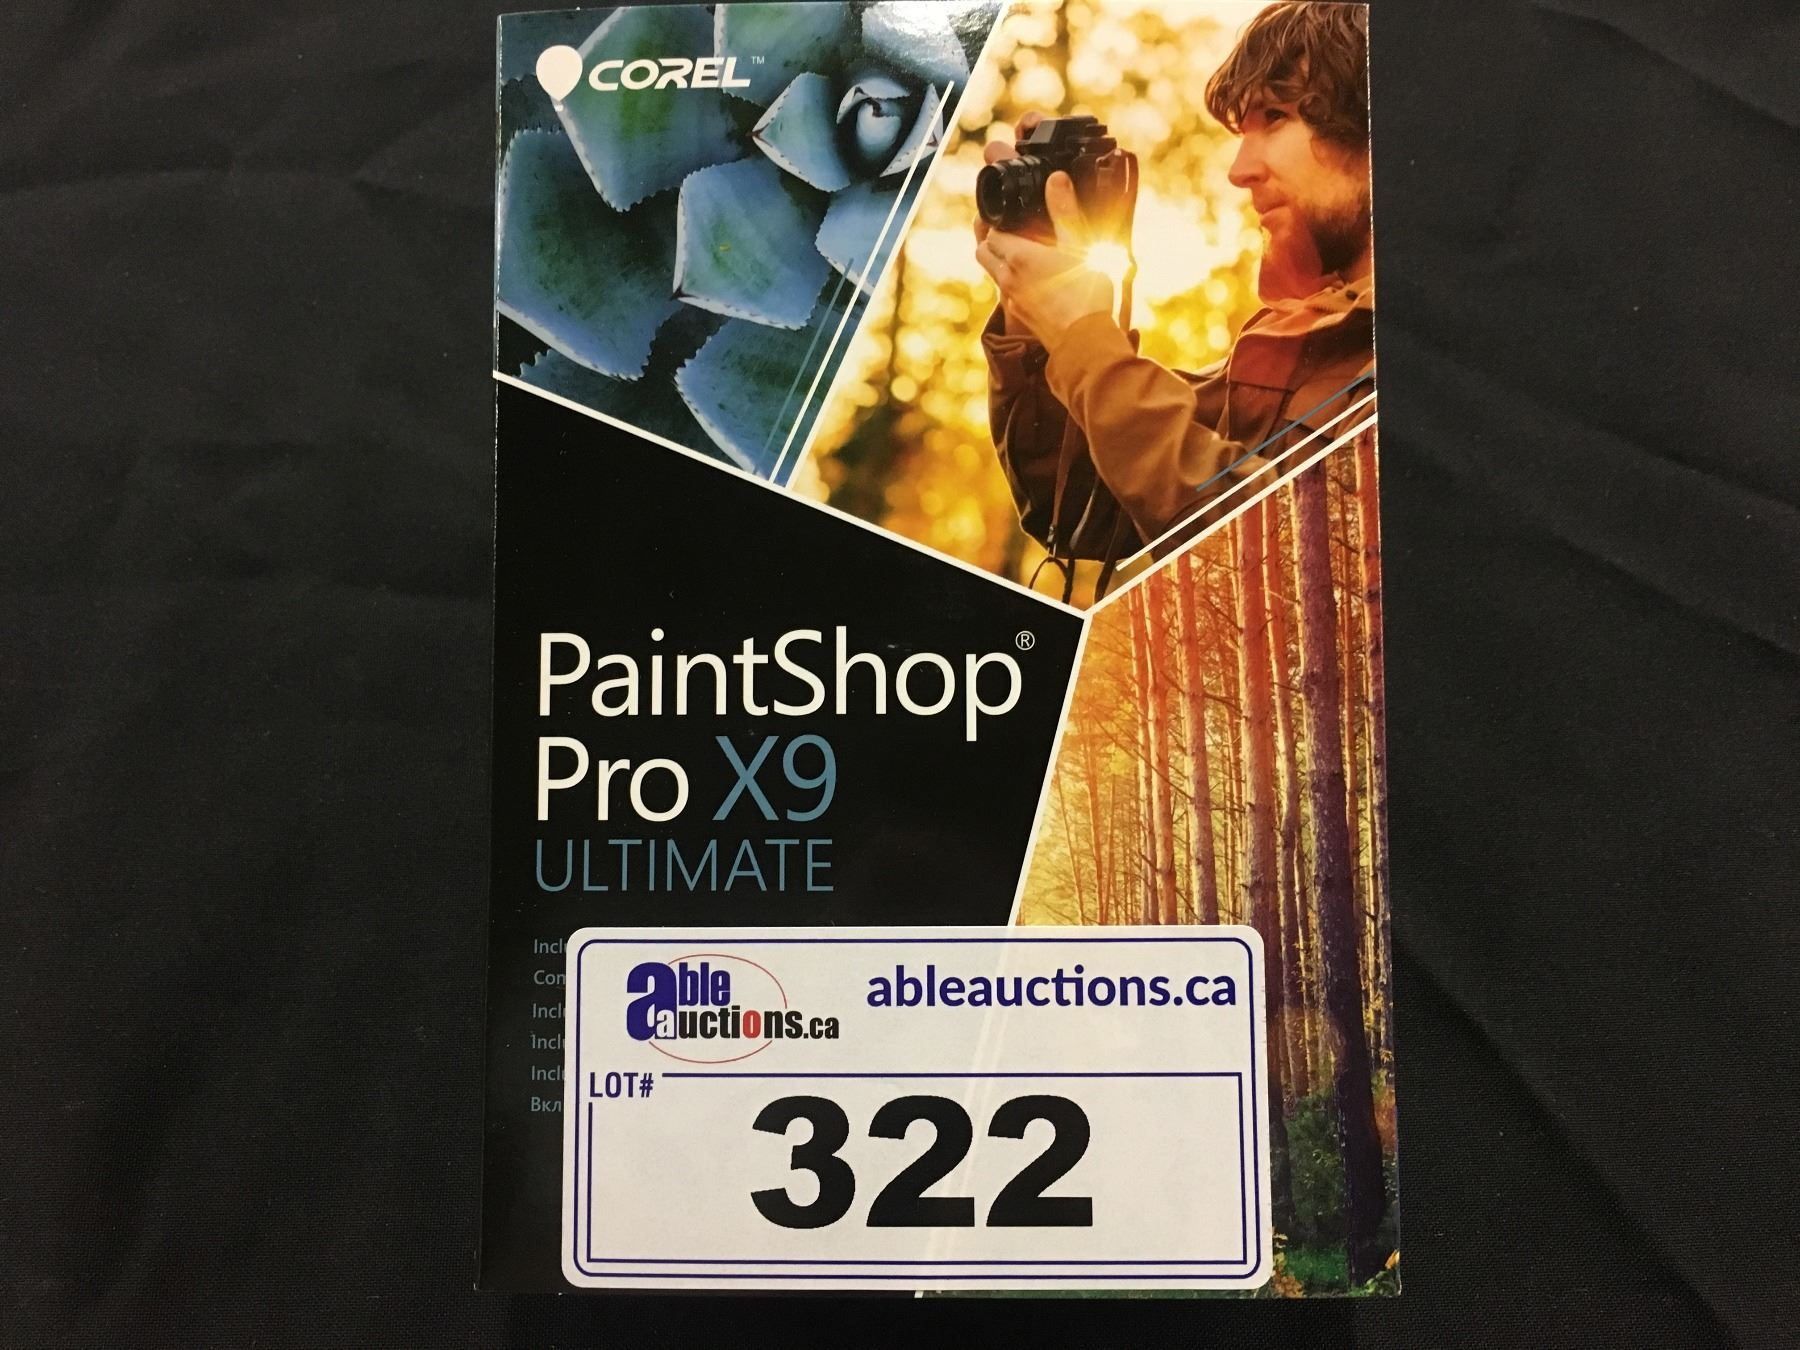 5x Corel Paintshop Pro X9 Ultimate Photo Editing And Graphic Design Software